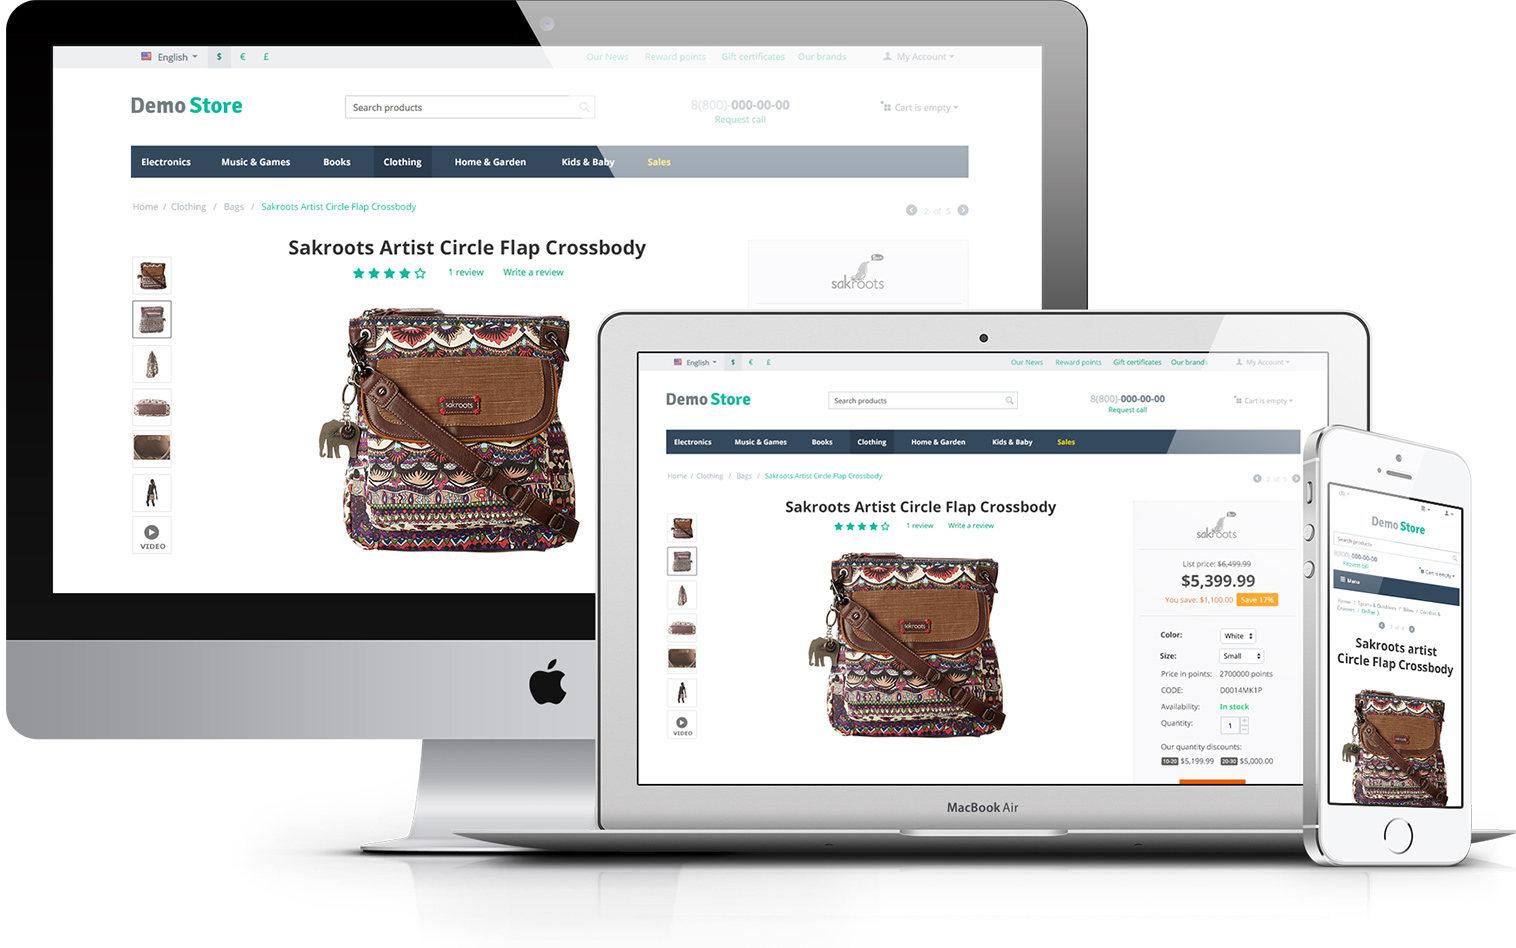 responsive online storefront